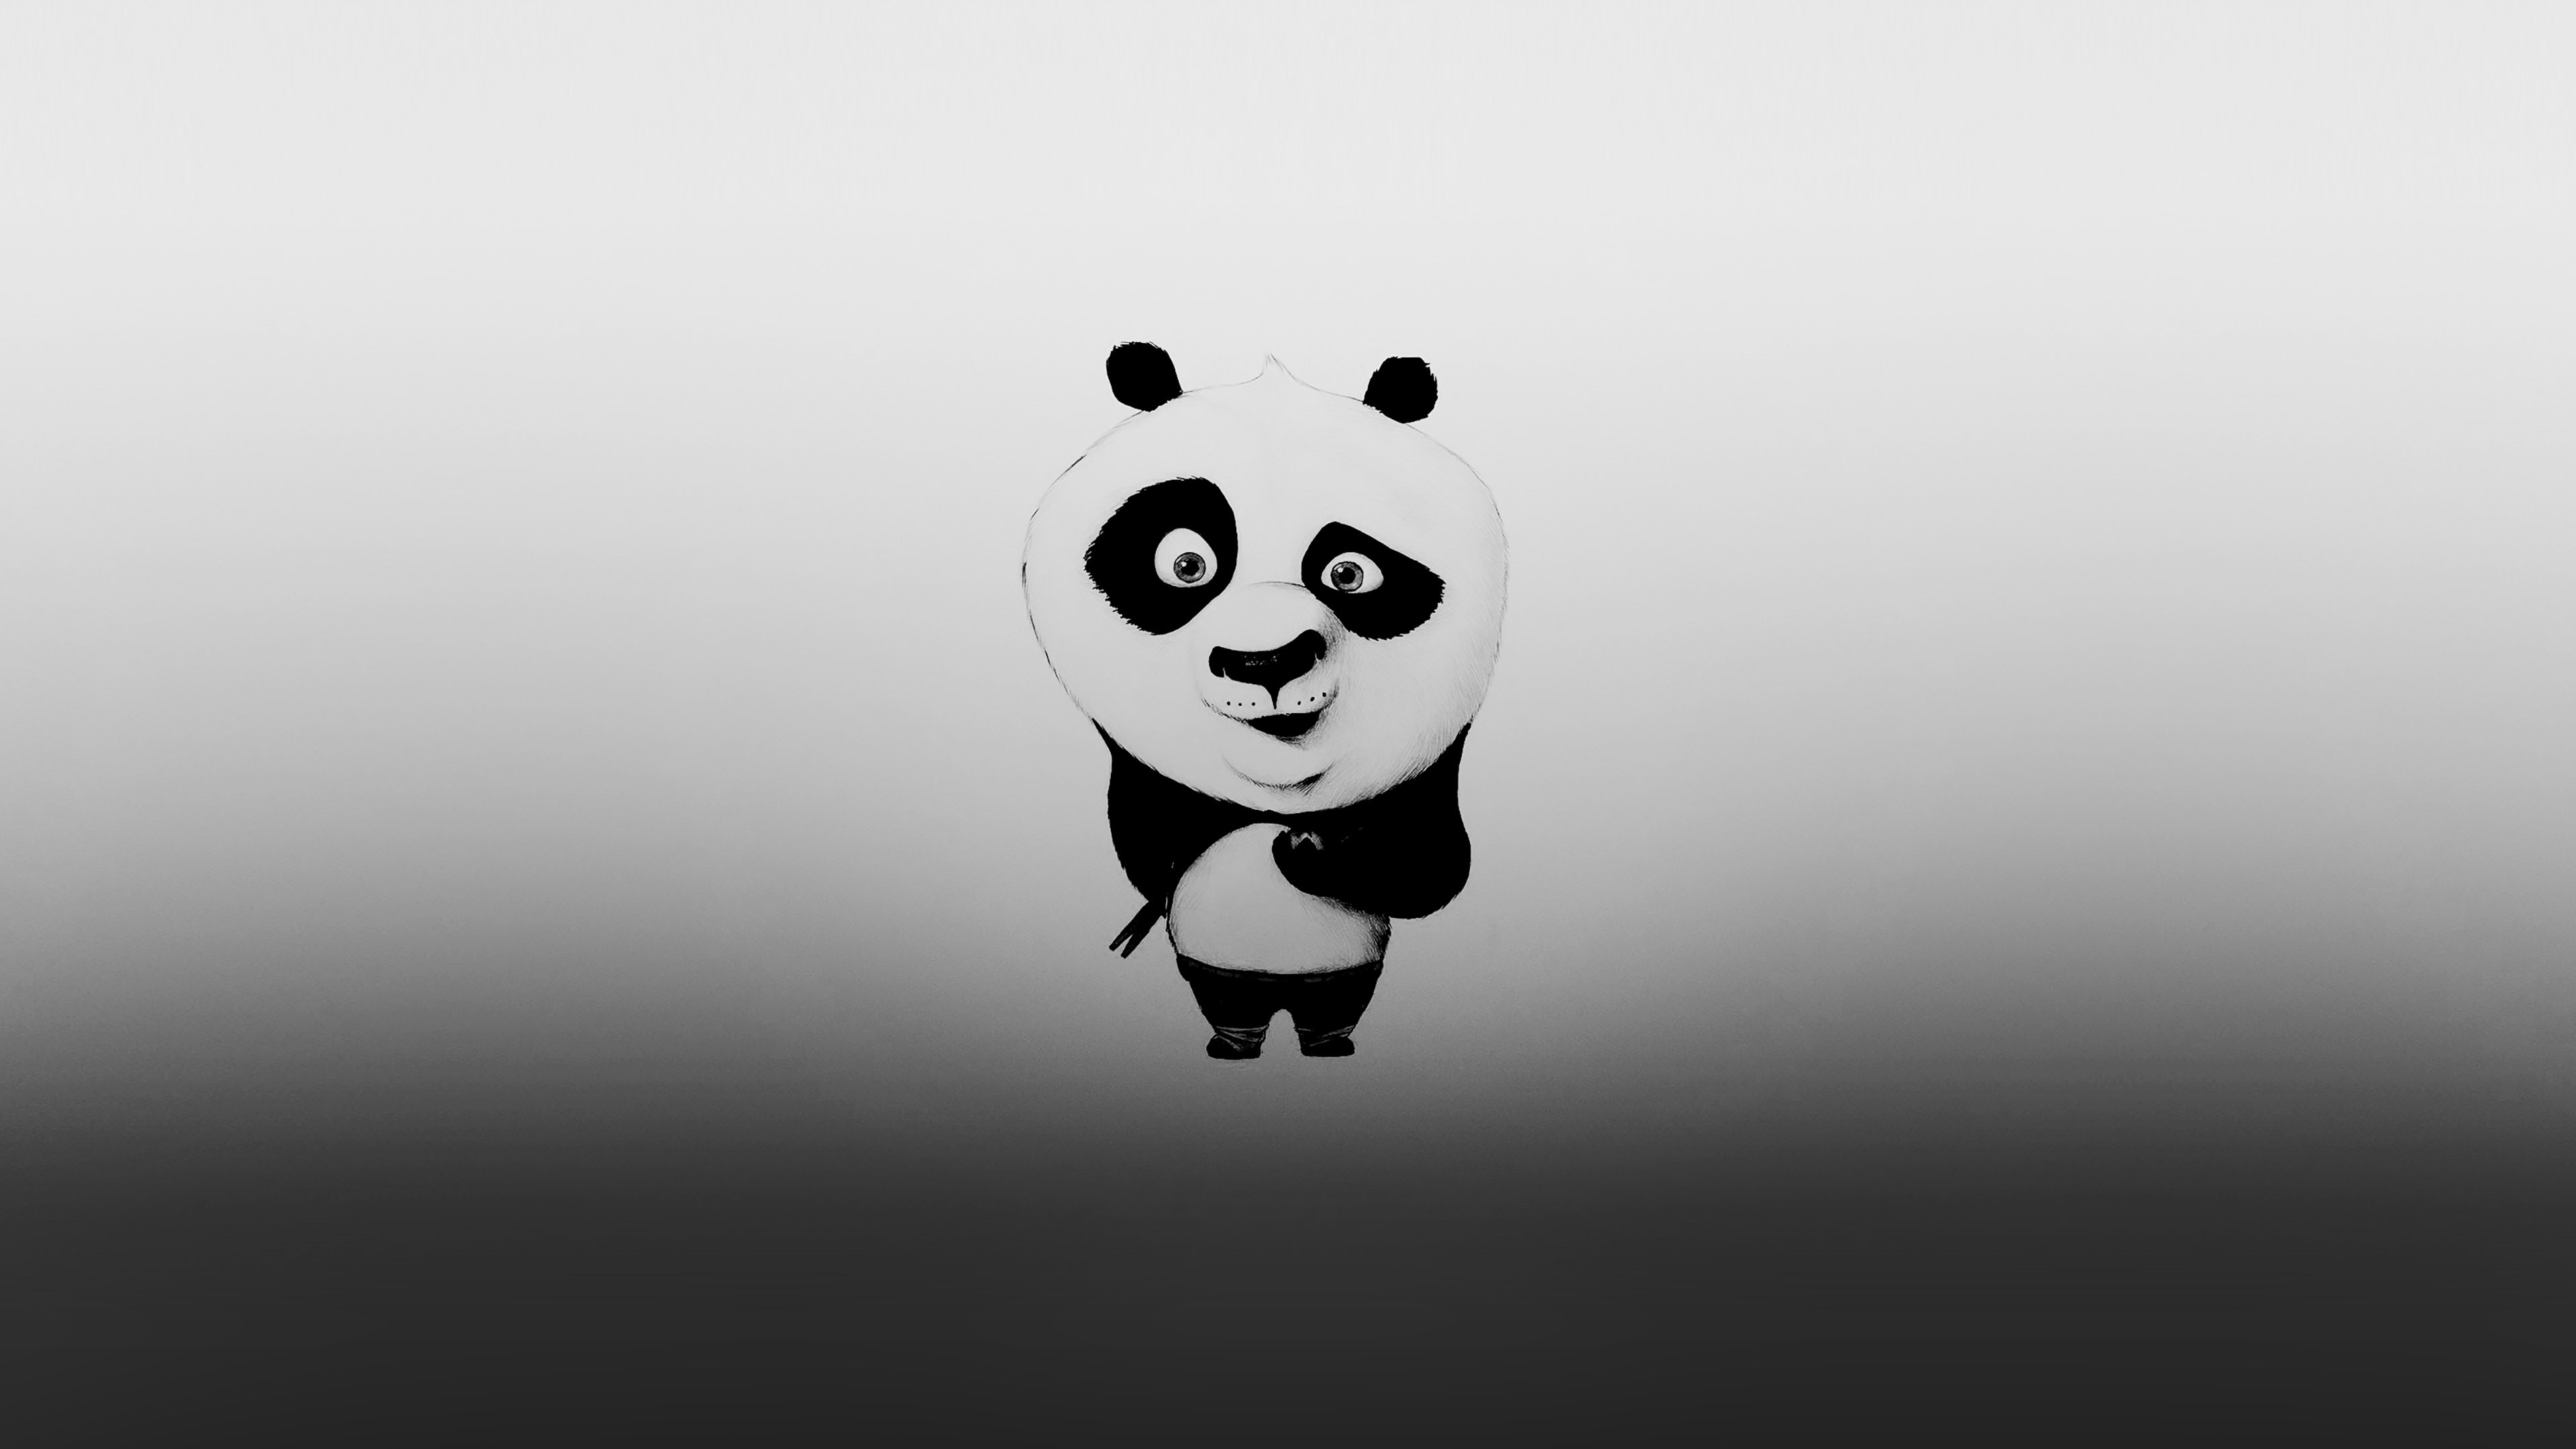 Wallpaper For Desktop Laptop Af59 Kungfu Panda Minimal Funny Cute